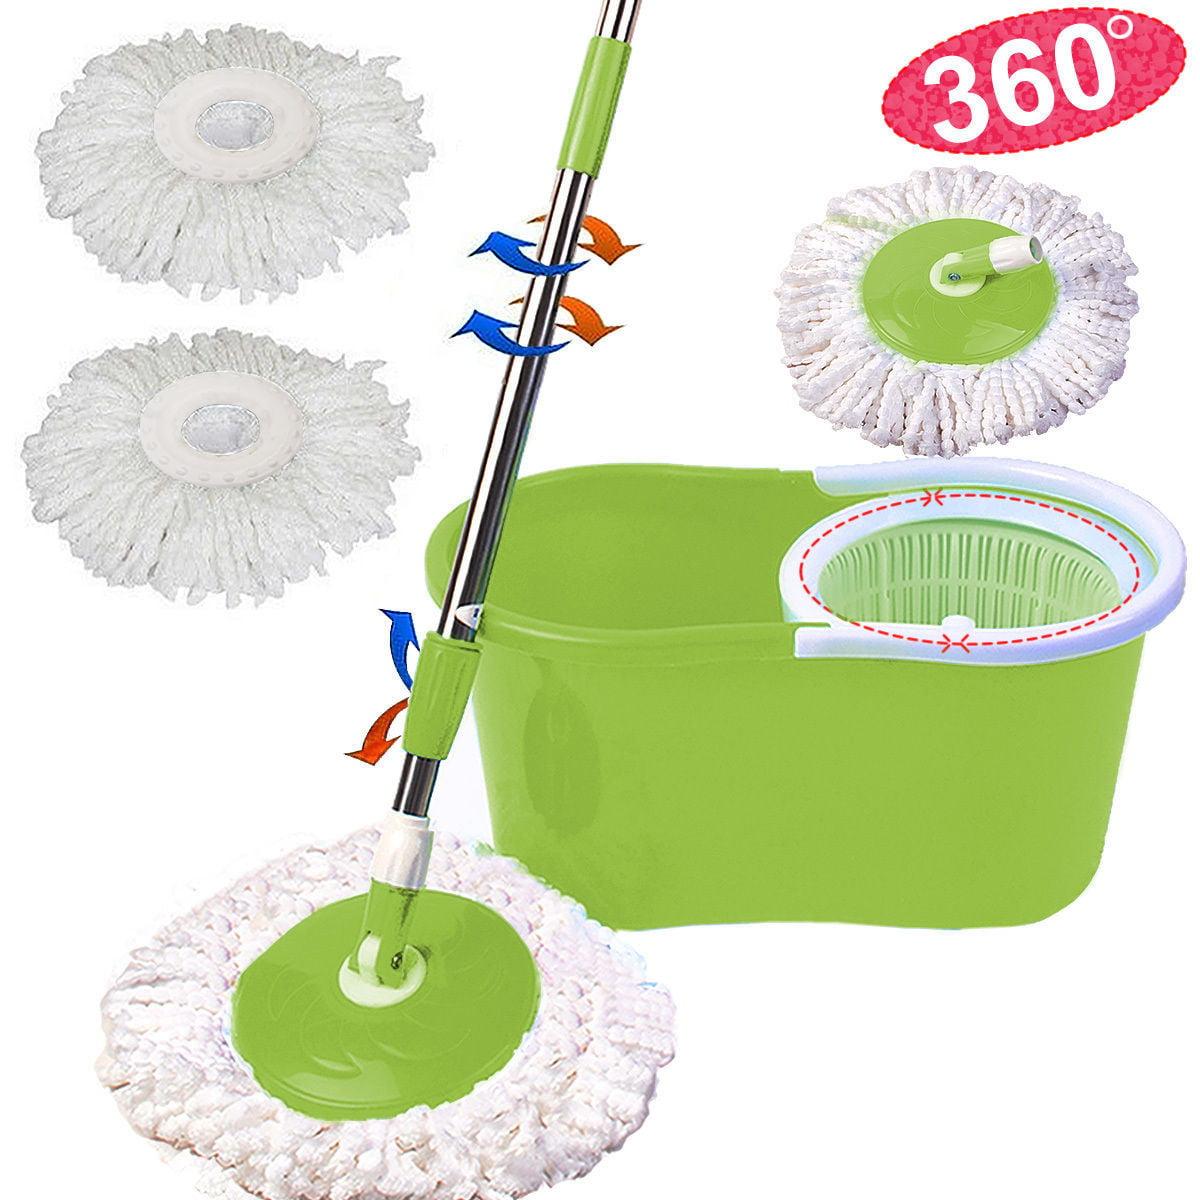 Zimtown Microfiber Spining Magic Mop W/Bucket 2 Heads Rotating 360 degree Easy Floor